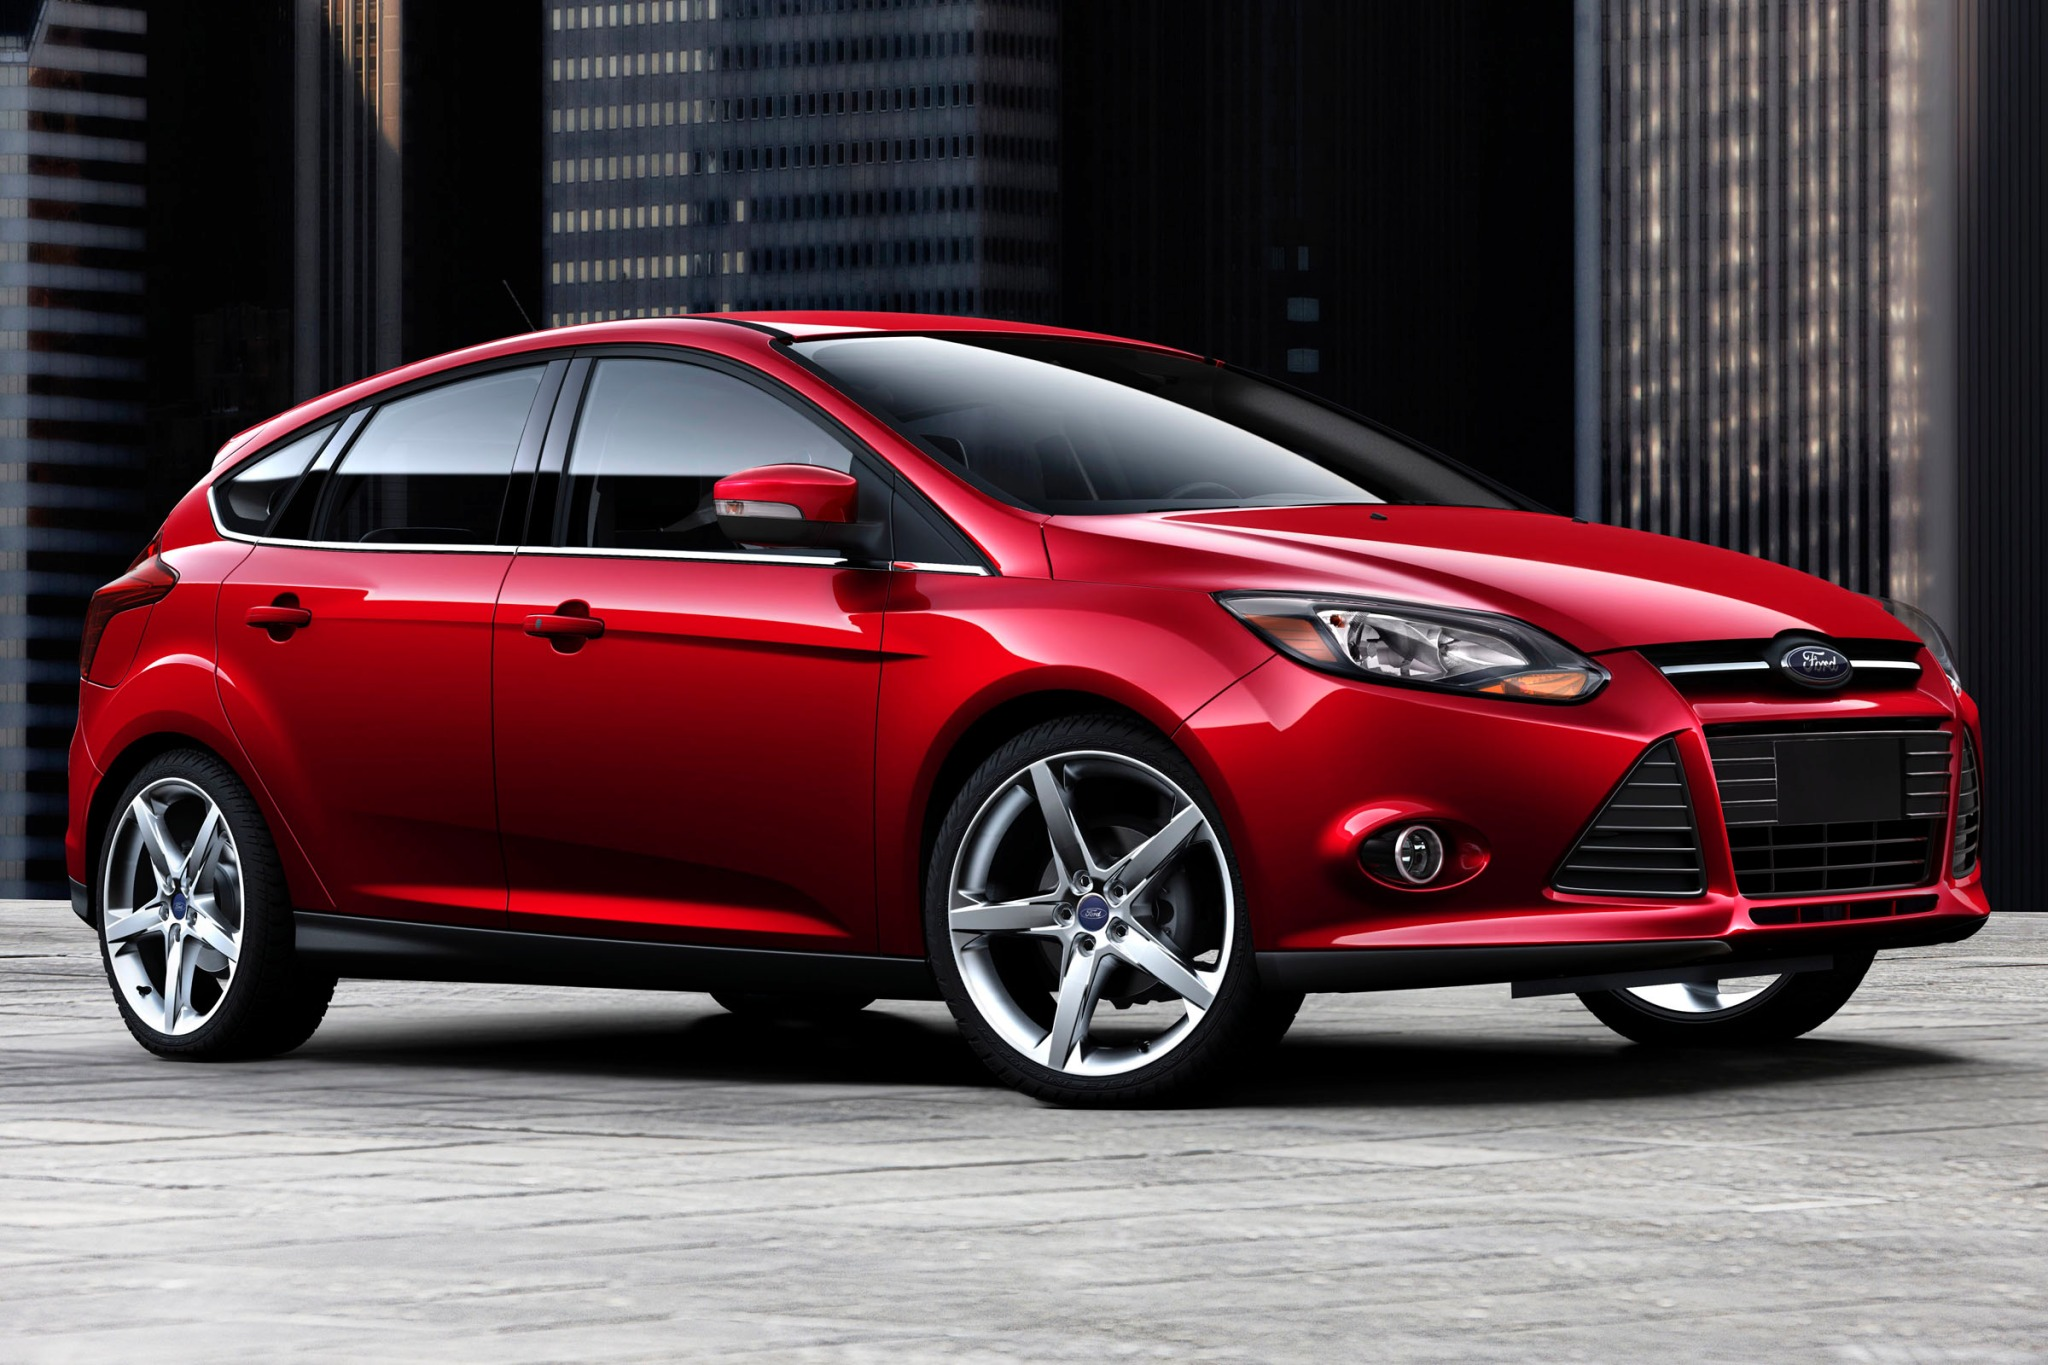 2013 ford focus 4dr hatchback titanium fq oem 1 2048